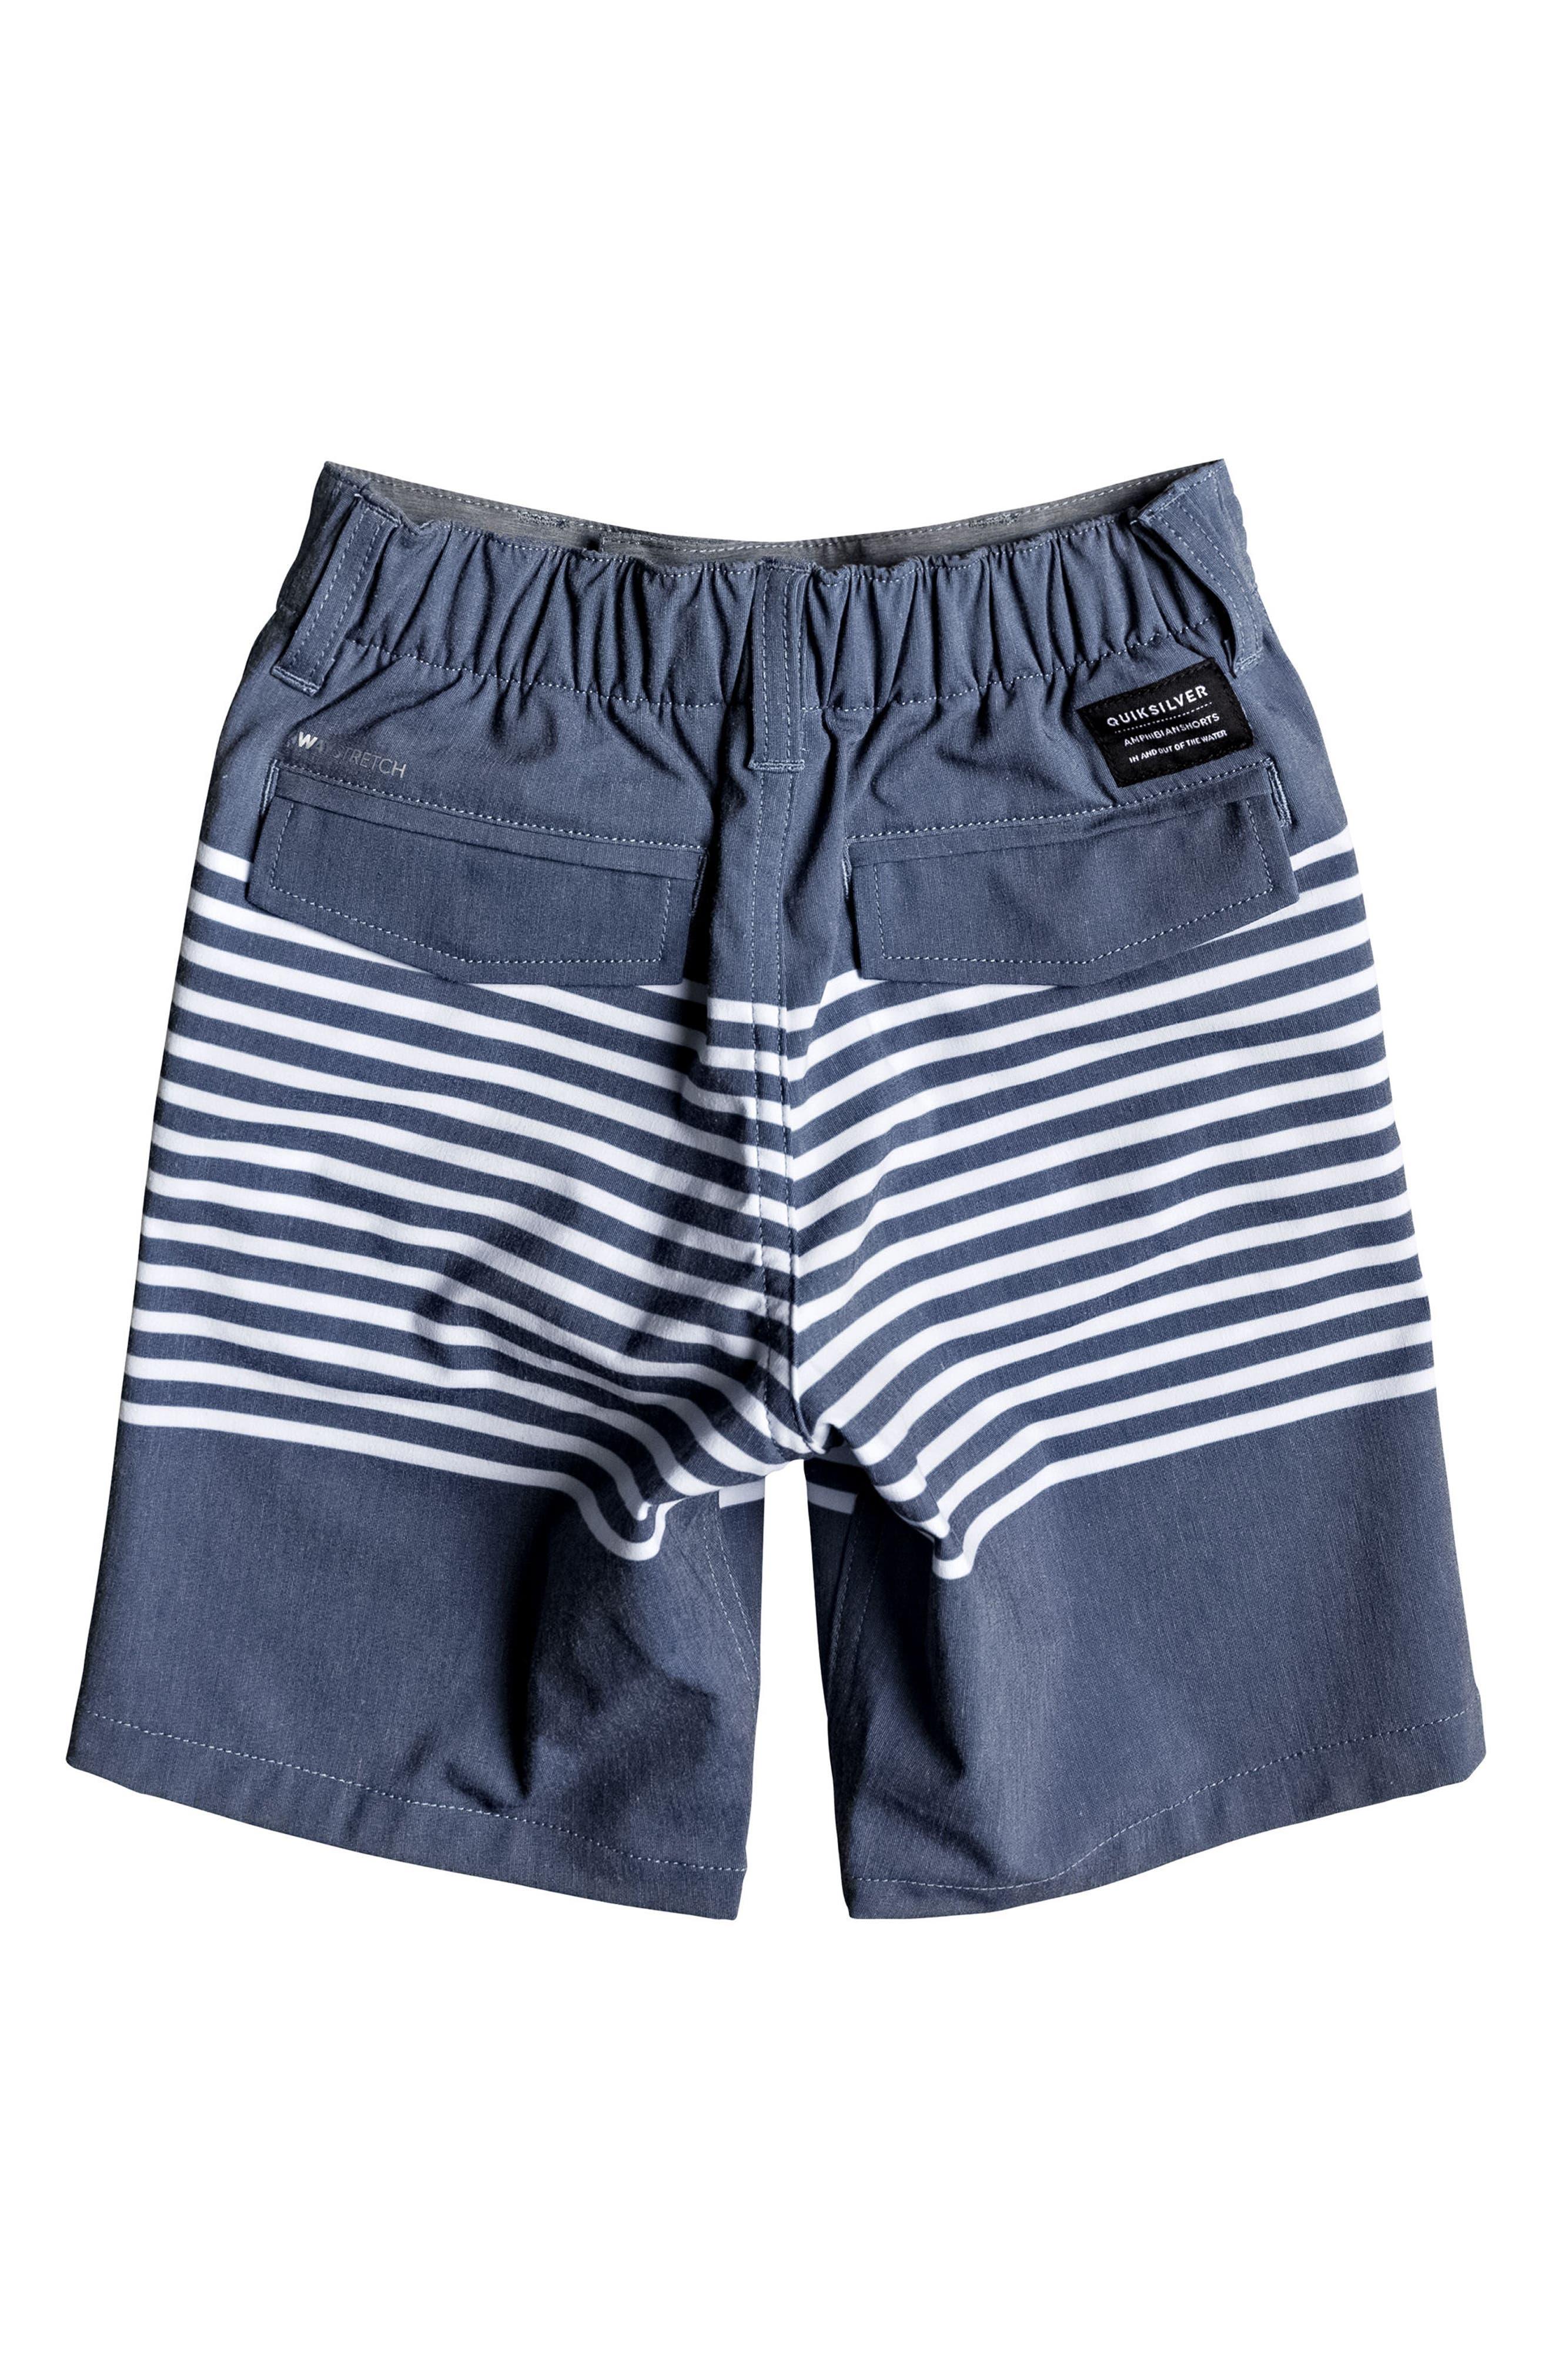 Echo Stripe Amphibian Board Shorts,                             Alternate thumbnail 2, color,                             401